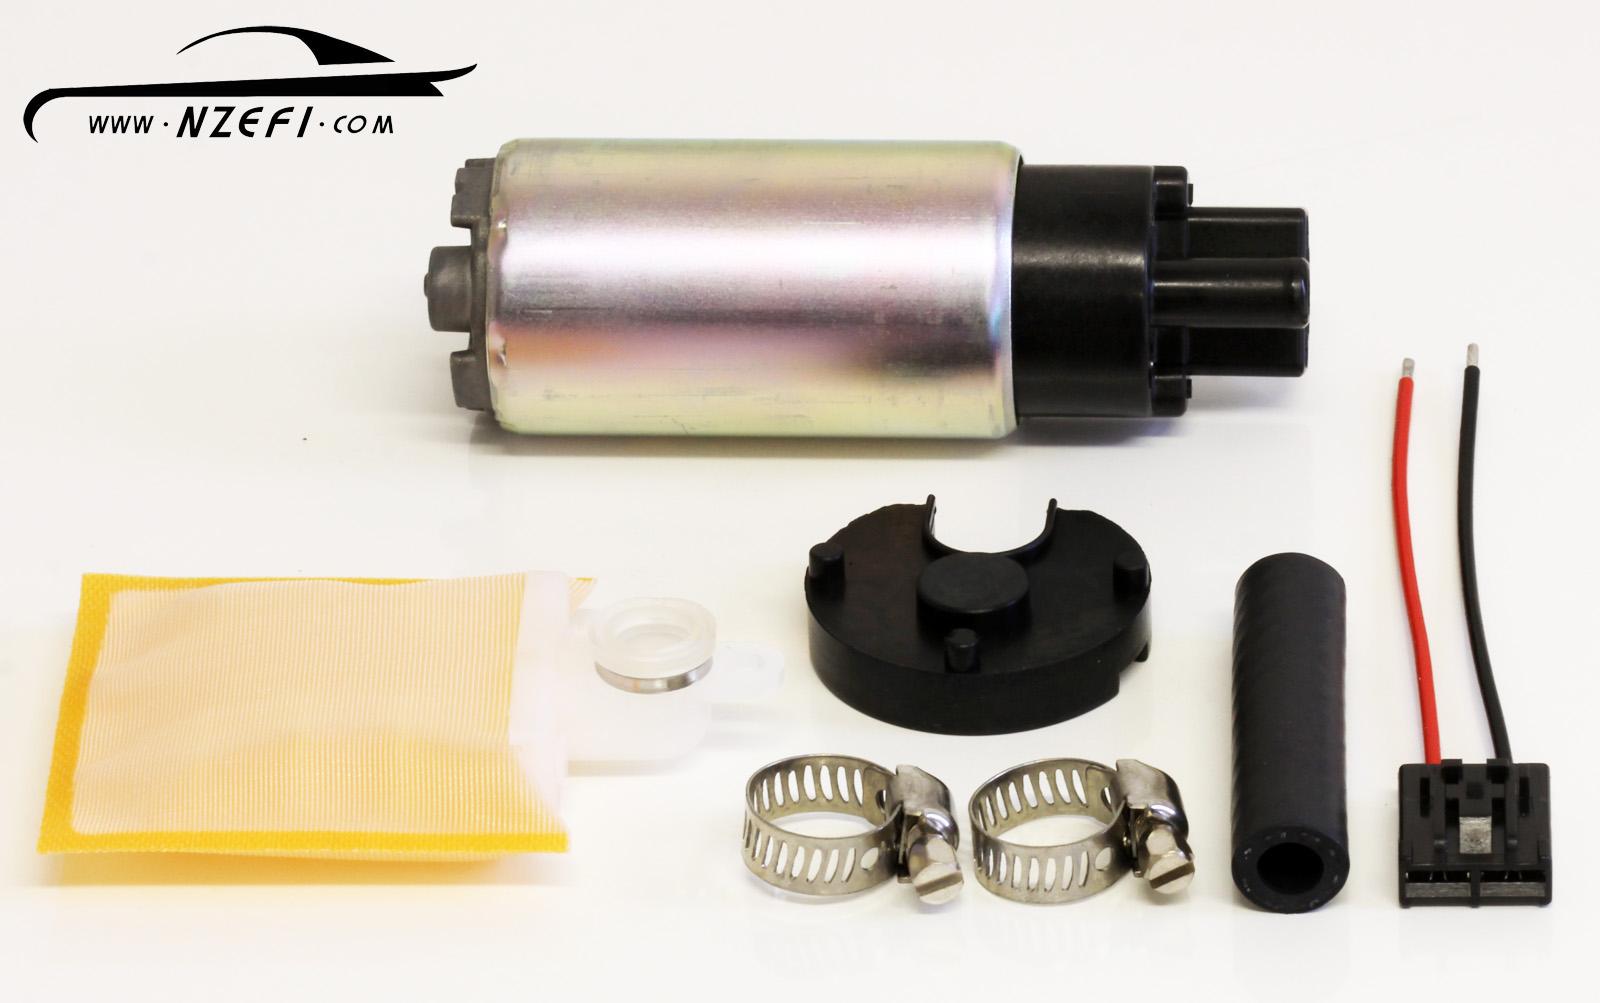 Fuel Pumps Nzefi Performance Tuning And Development Gtr Filter Denso 38mm Universal Efi Pump 145 Lph At 3 Bar